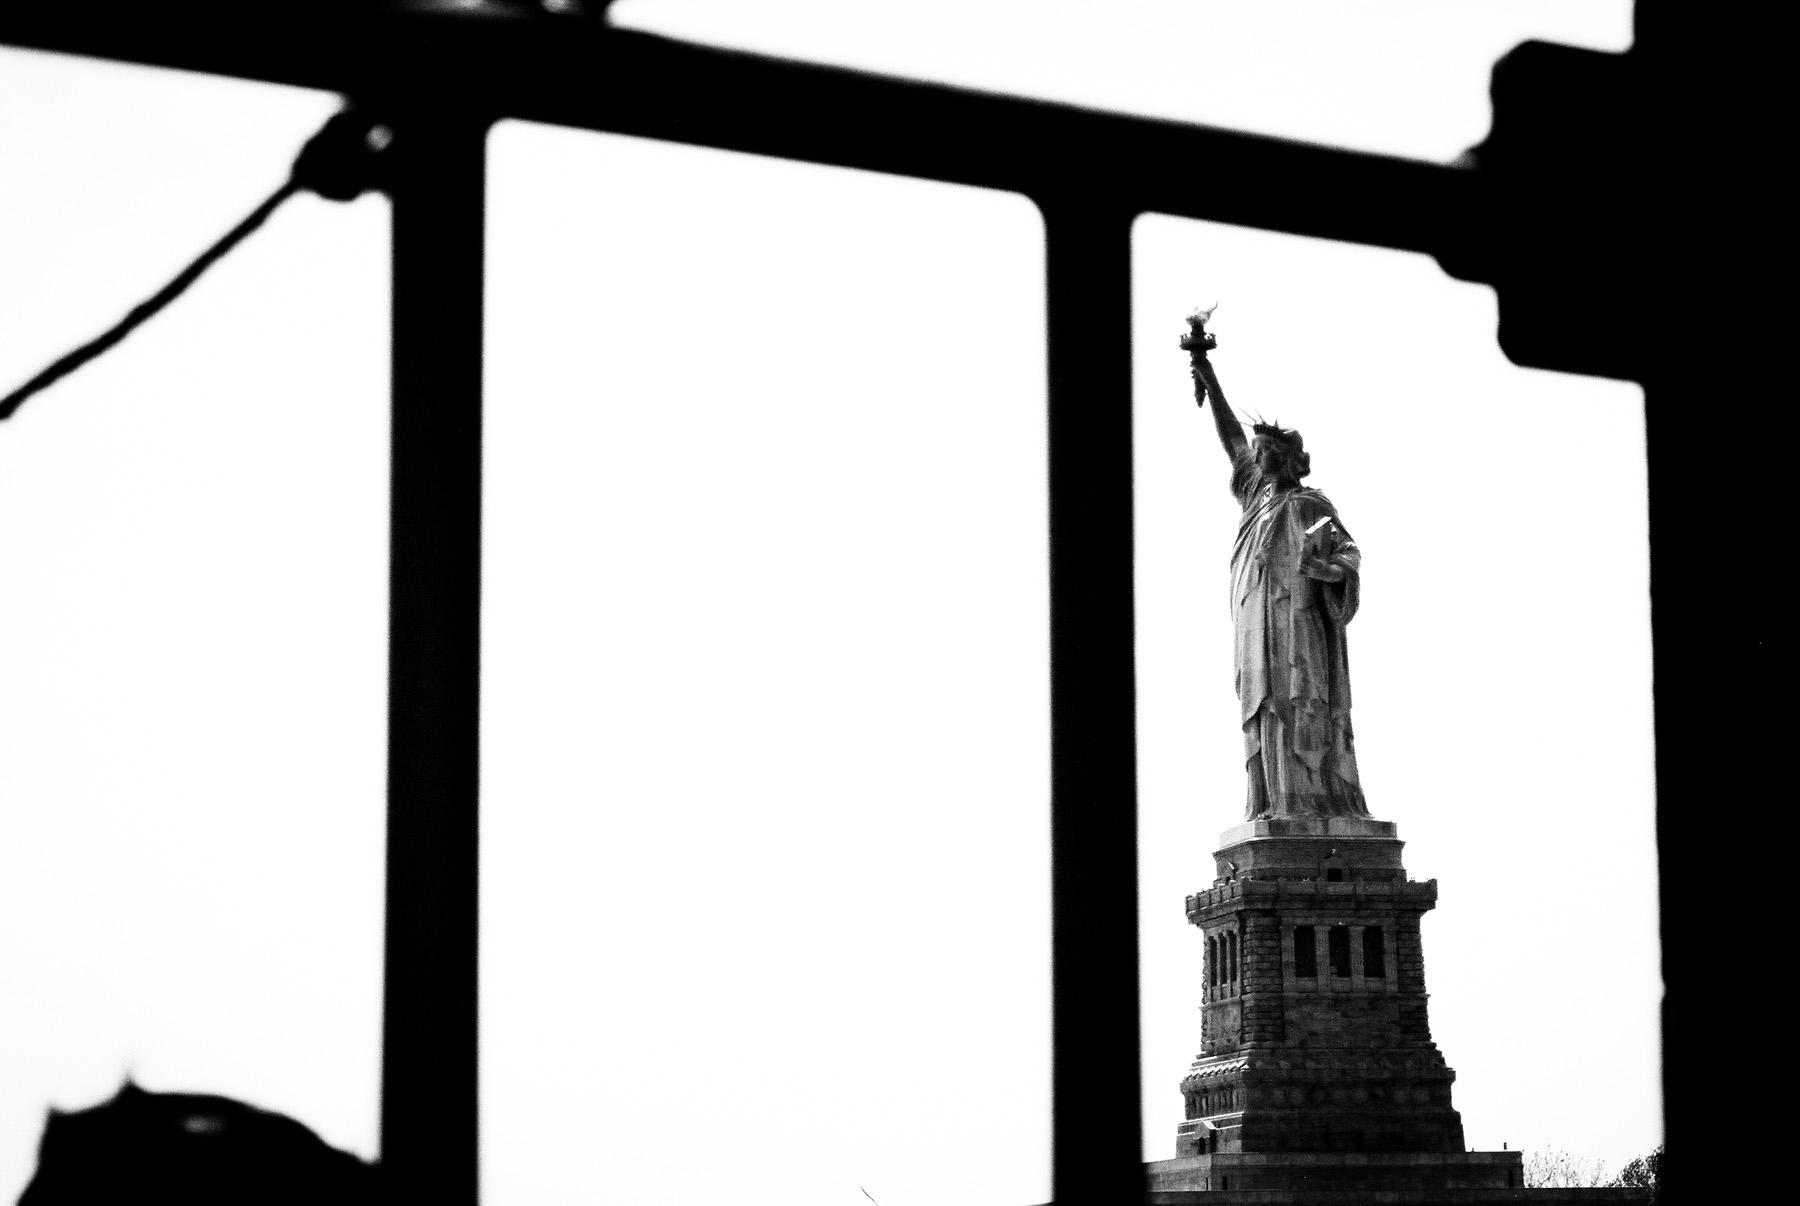 Statue of Liberty 012.jpg